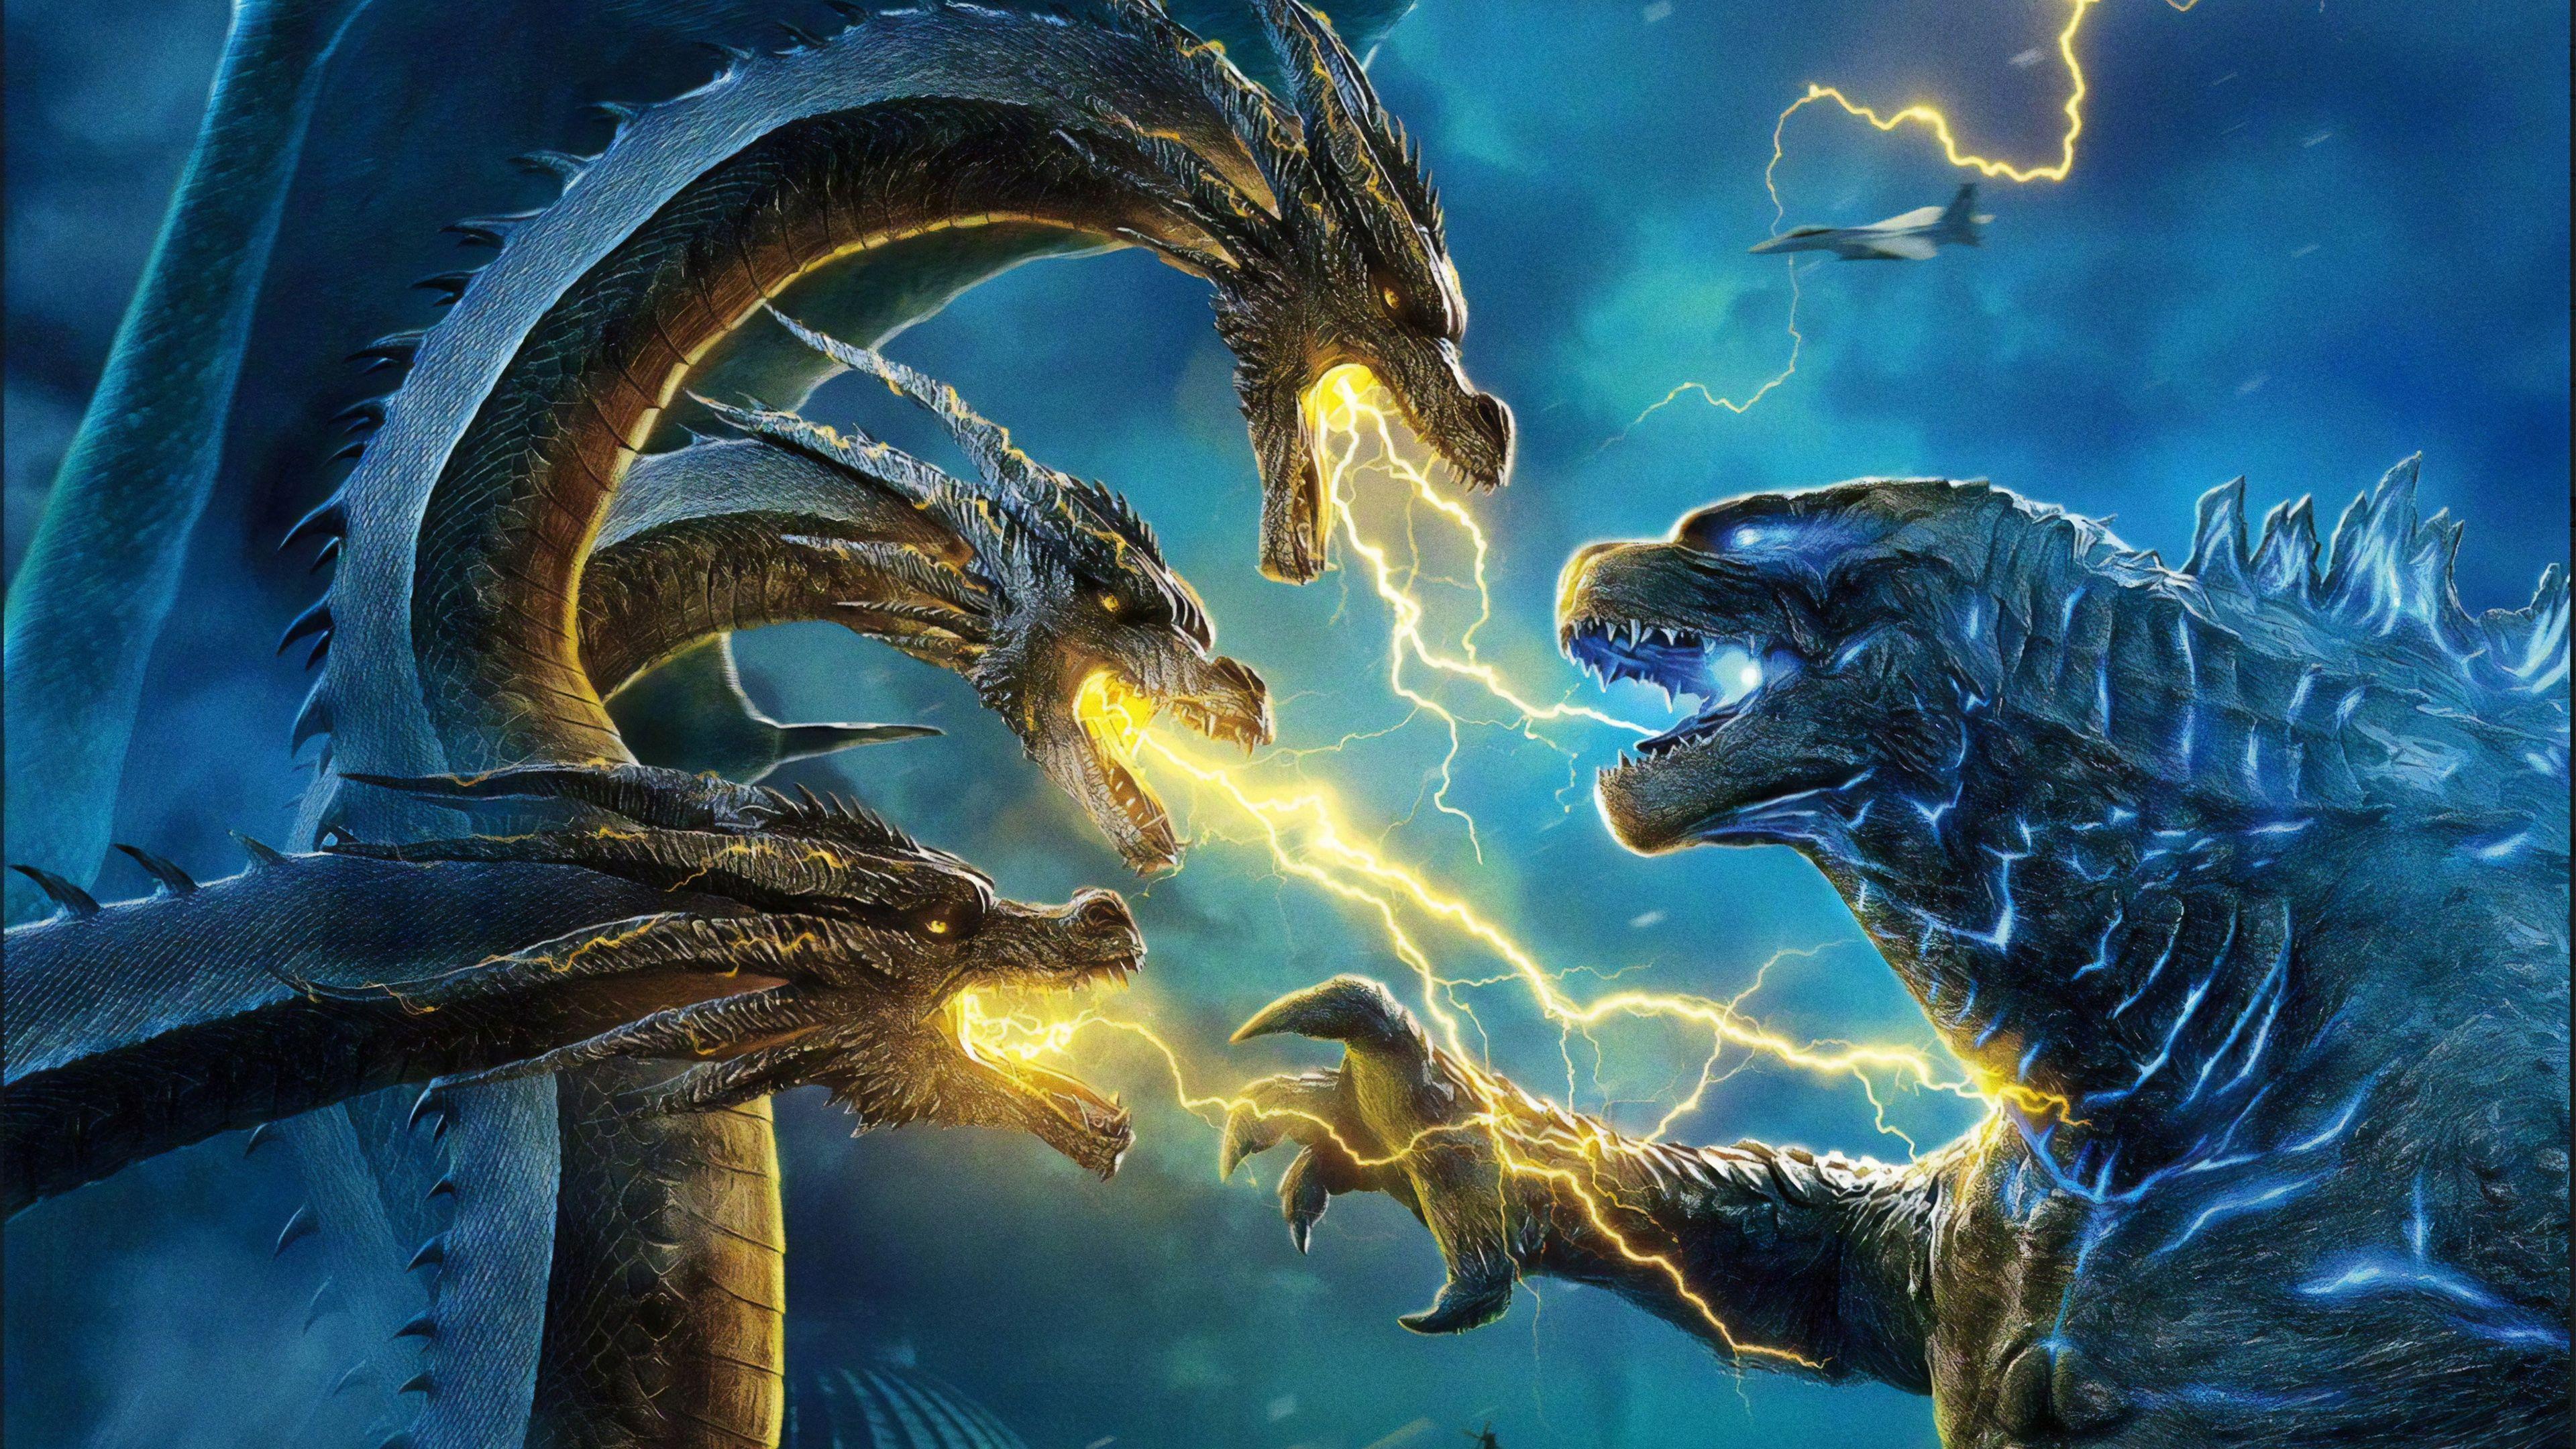 Godzilla Vs. King Ghidorah Wallpapers   Top Free Godzilla Vs. King ...